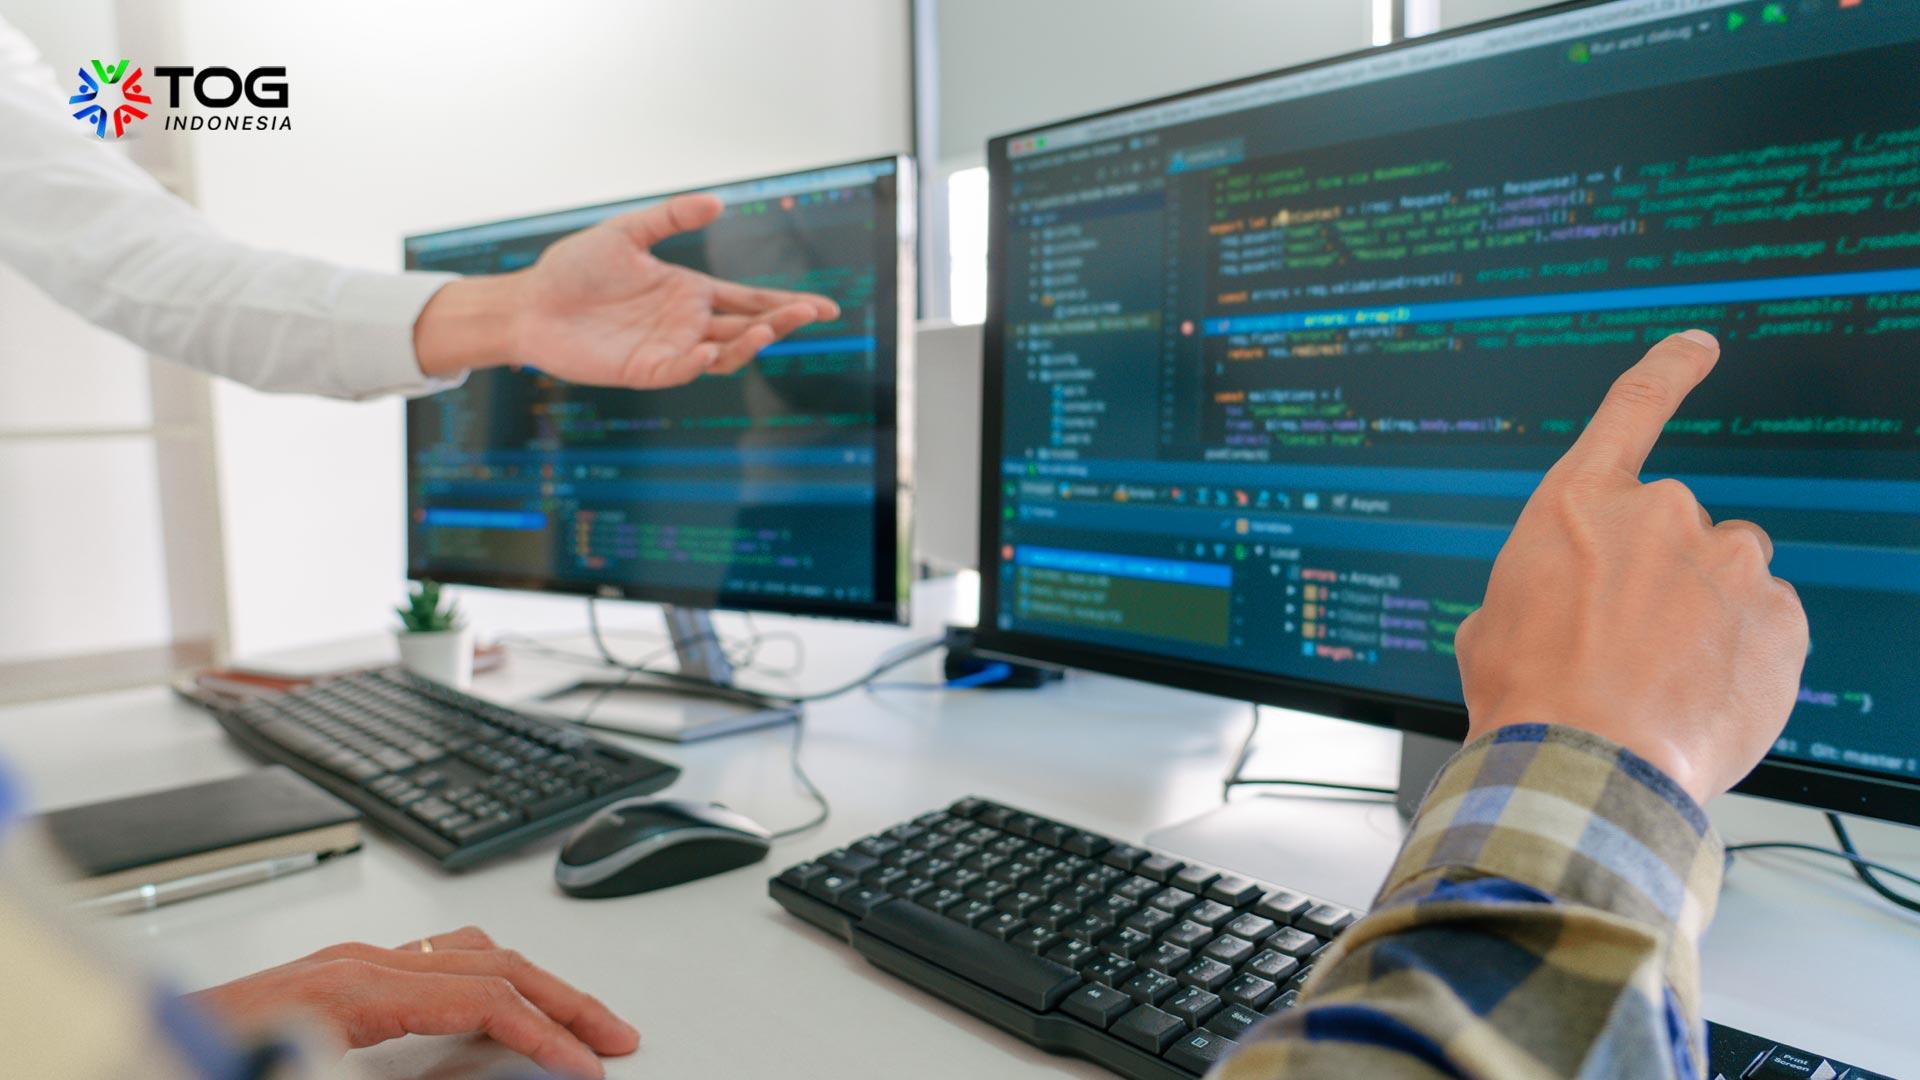 Ingin Bangun Website yang Keren? Wajib Paham 5 Istilah Angular ini